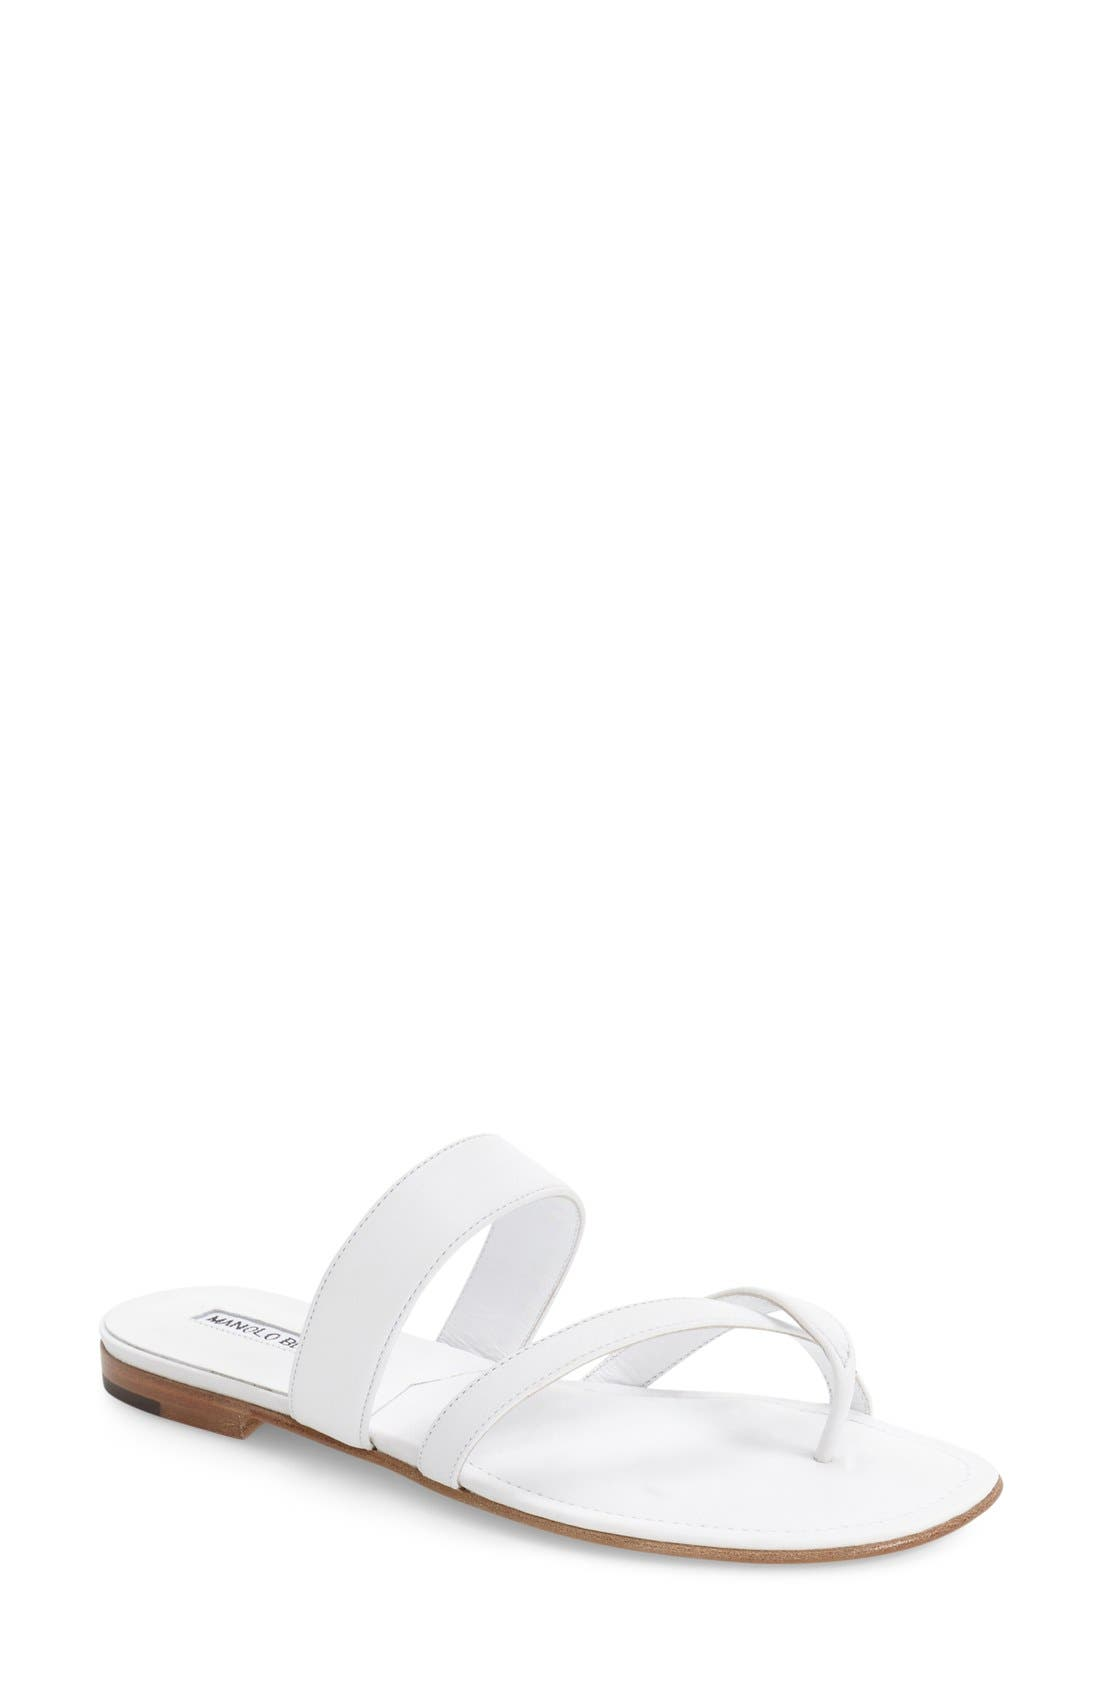 Slide Sandal,                             Main thumbnail 1, color,                             White